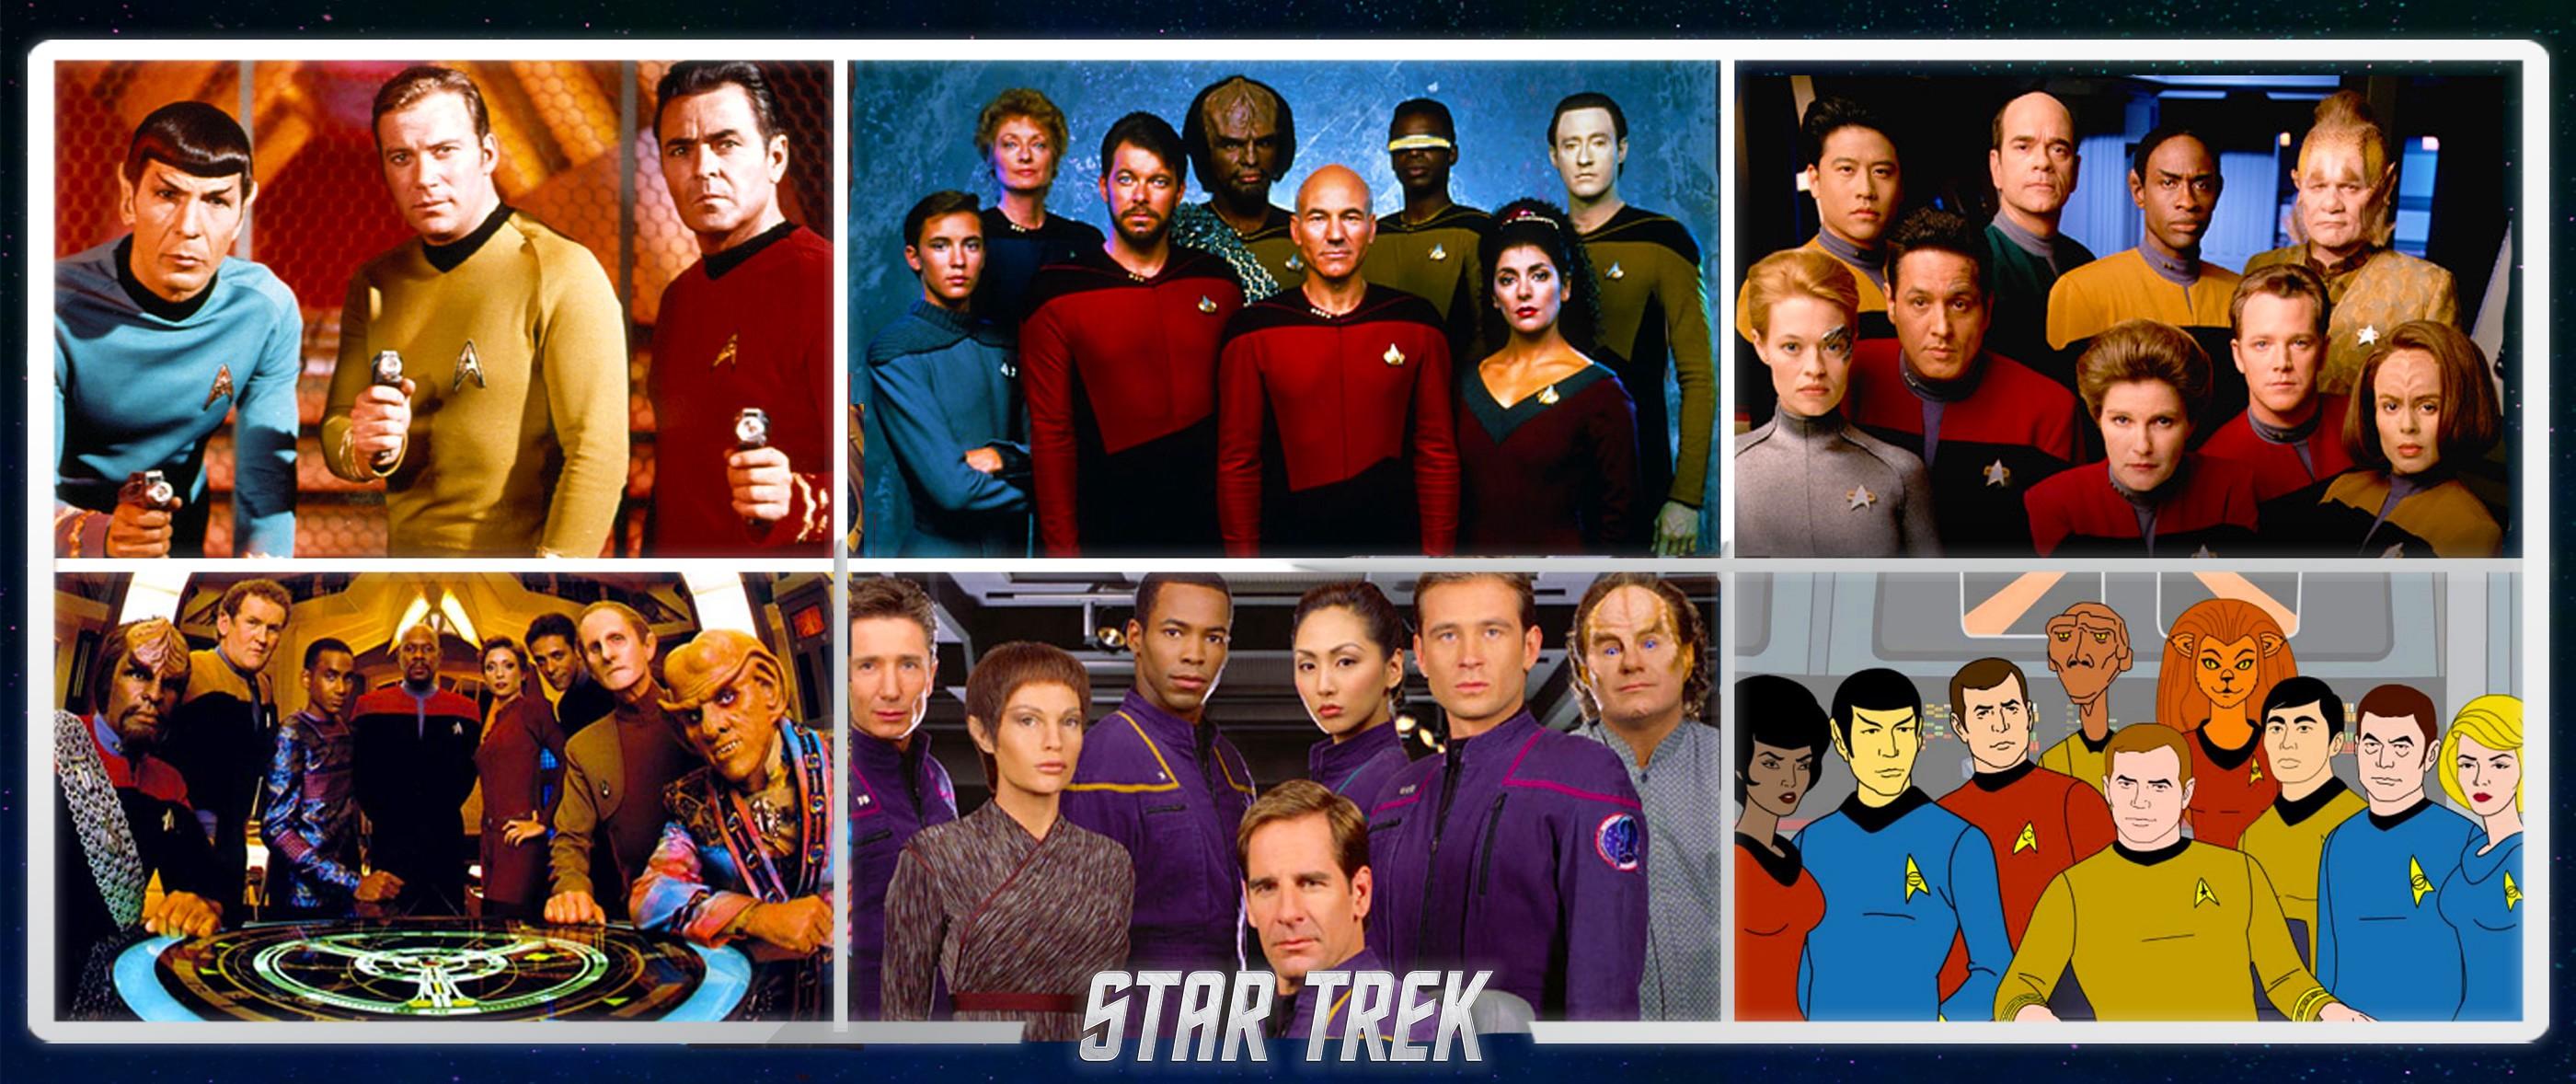 Every Episode of Star Trek